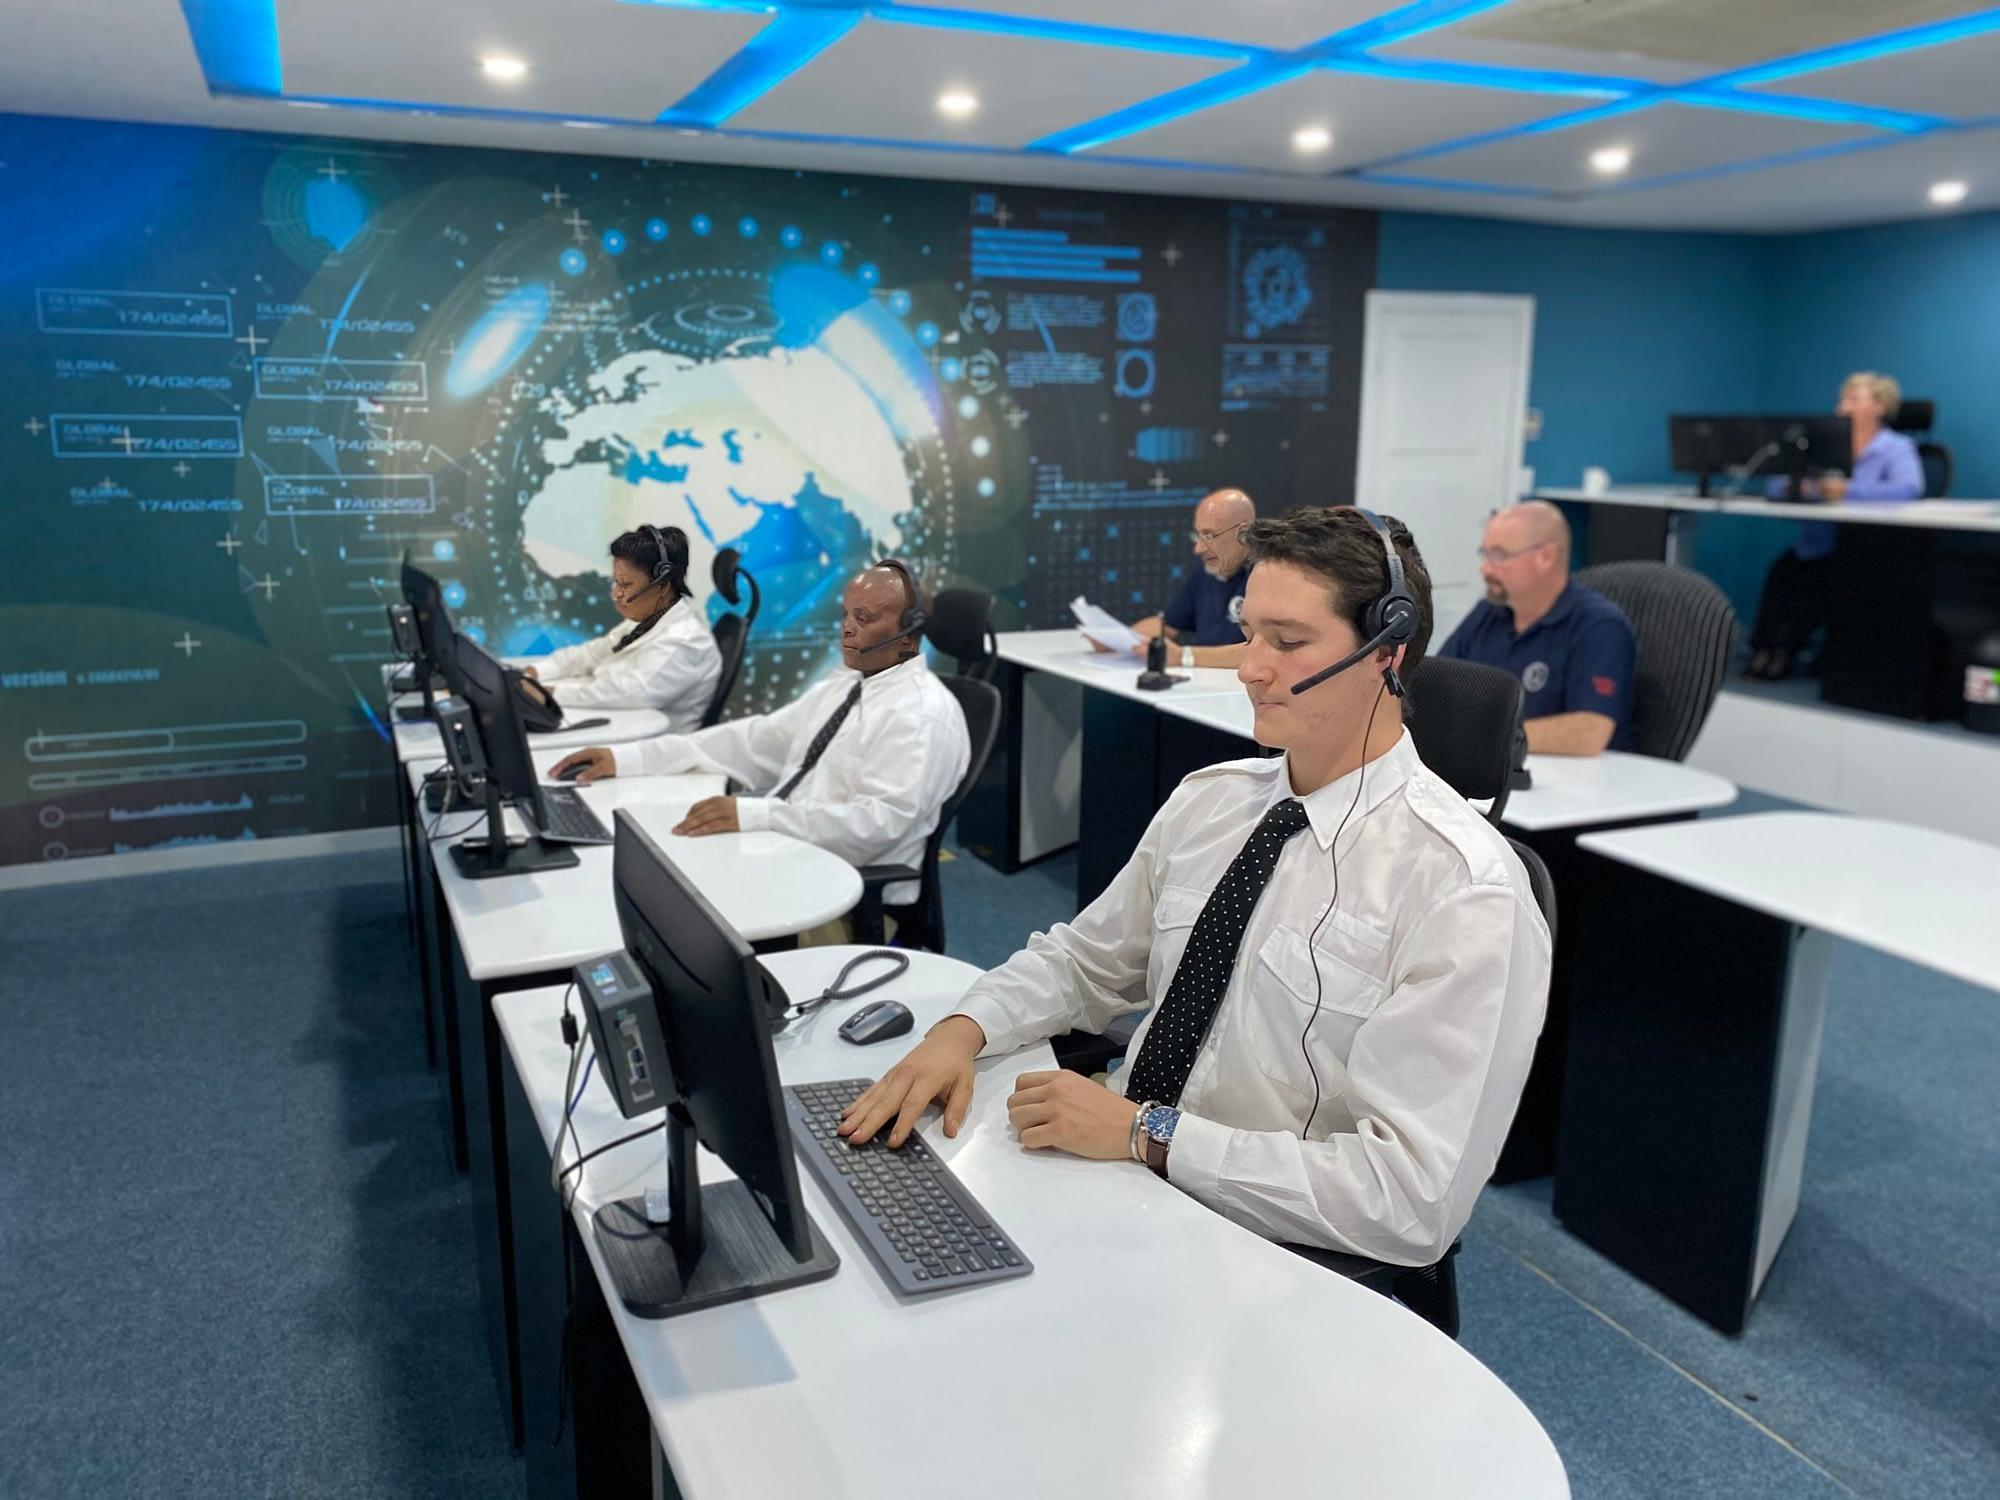 TSU Protection Services -24/7 Control Room Monitoring